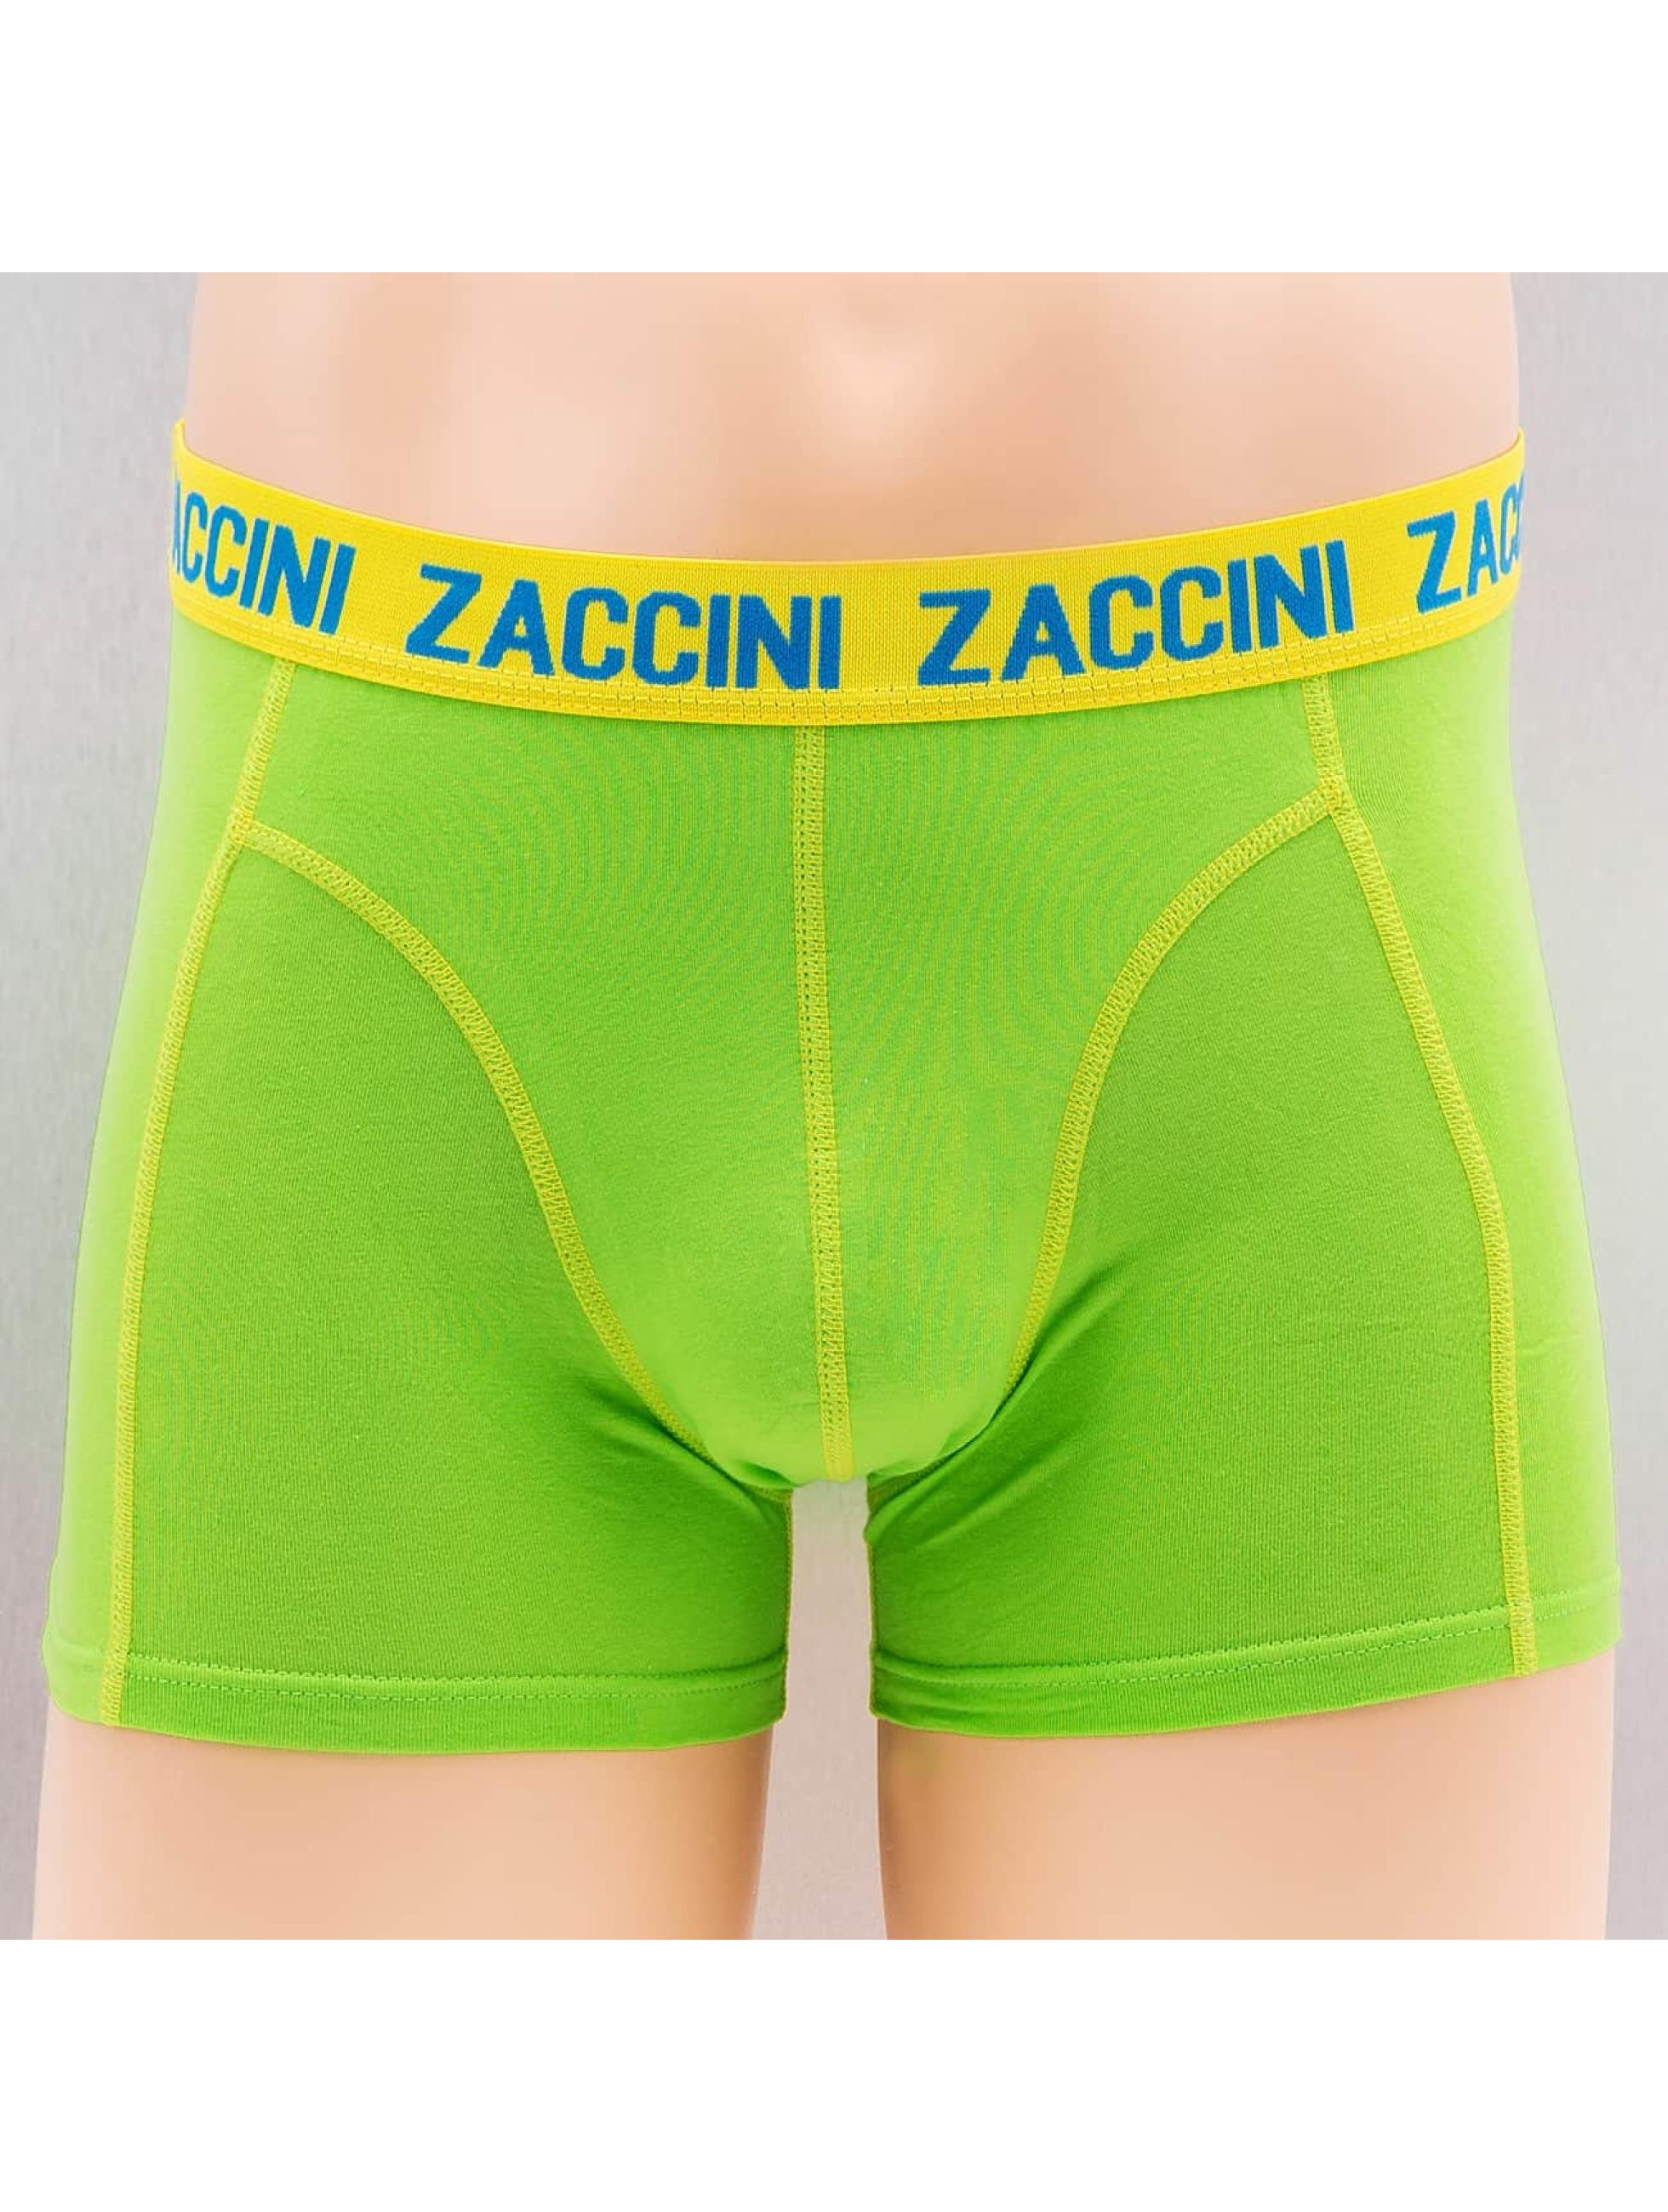 Zaccini Семейные трусы Caribean 2-Pack зеленый